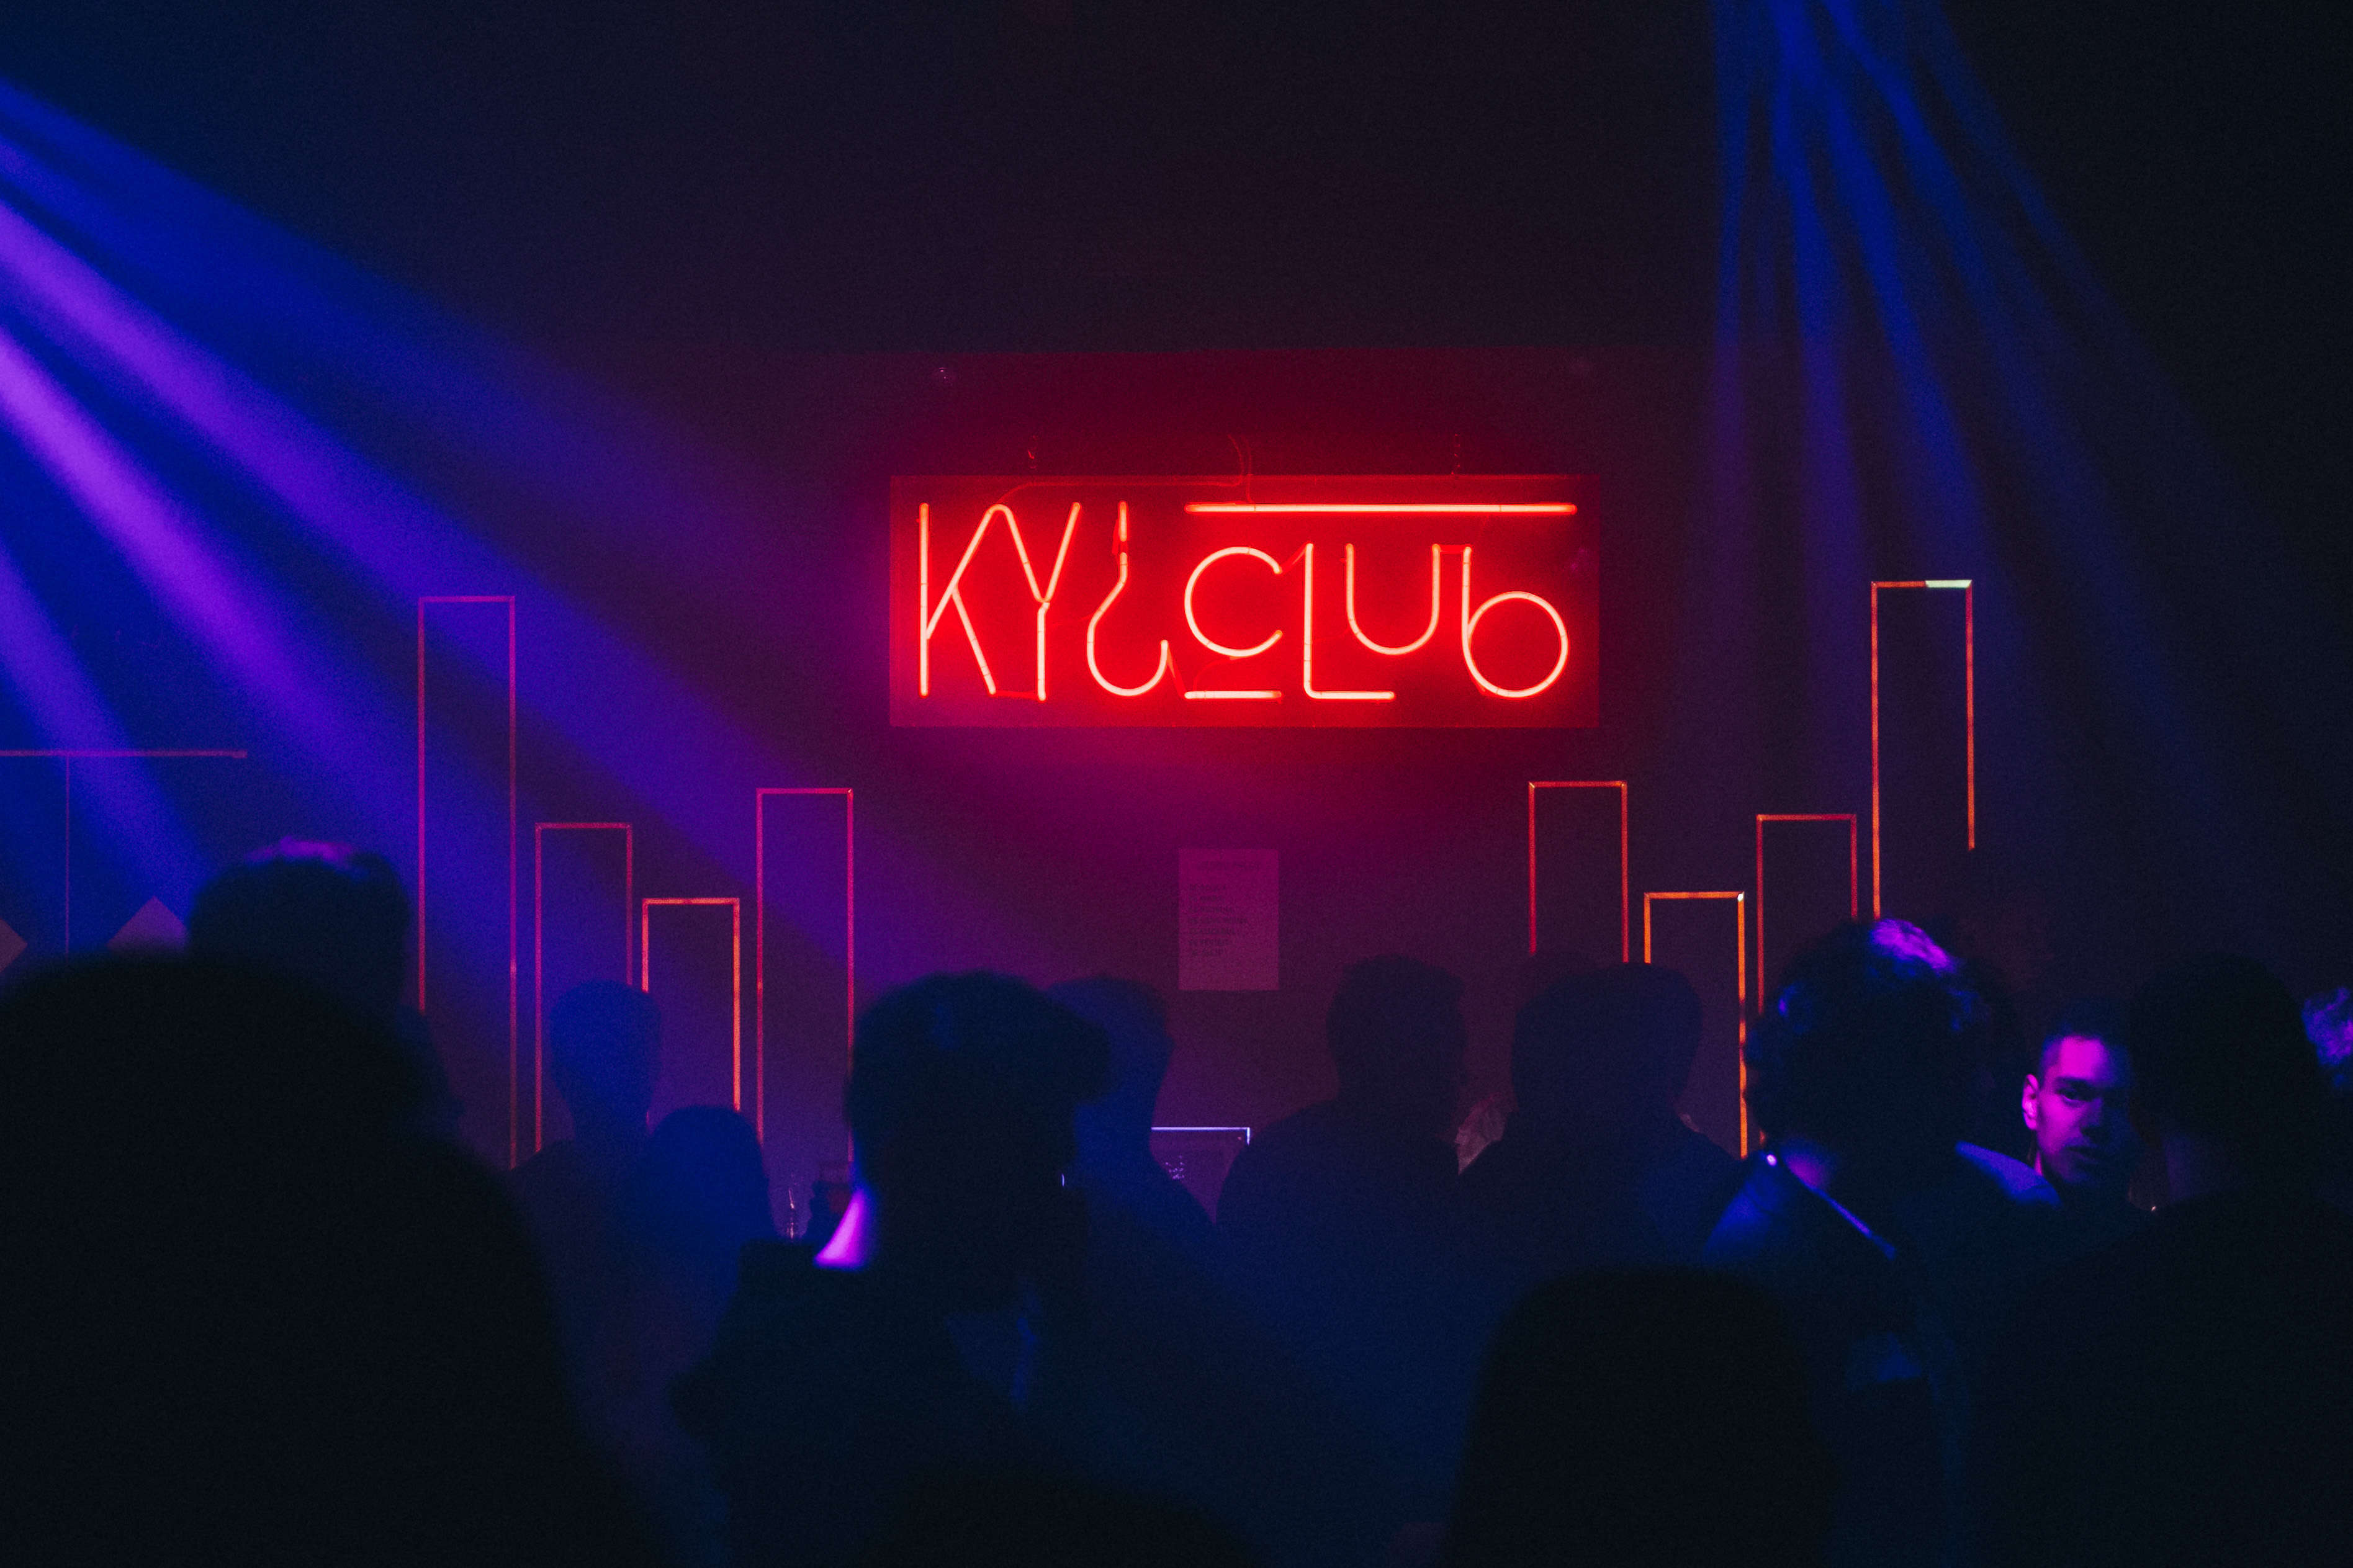 Disco club KYI - Modena 2017